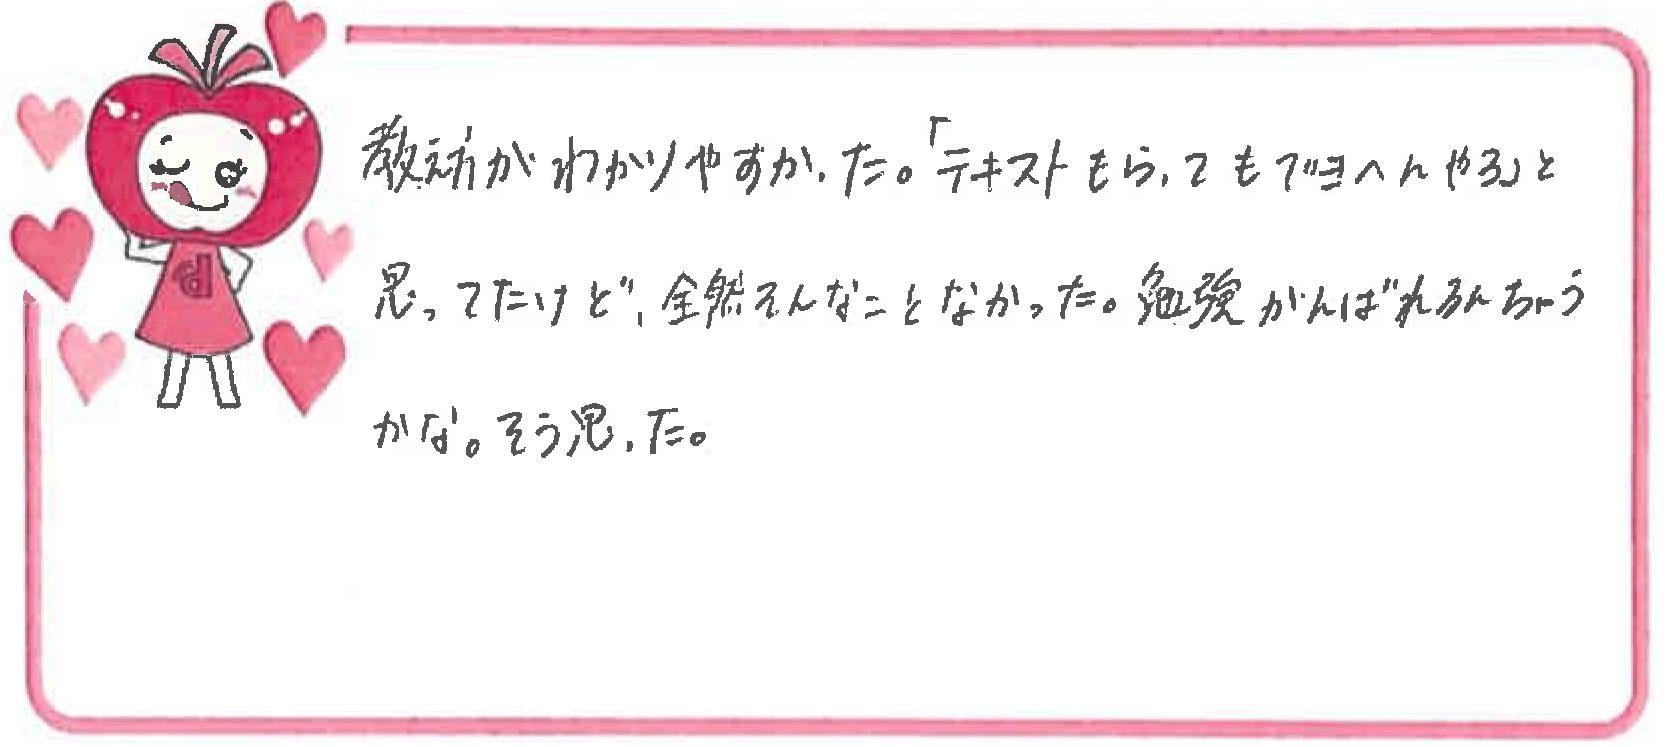 Tちゃん(草津市)からの口コミ